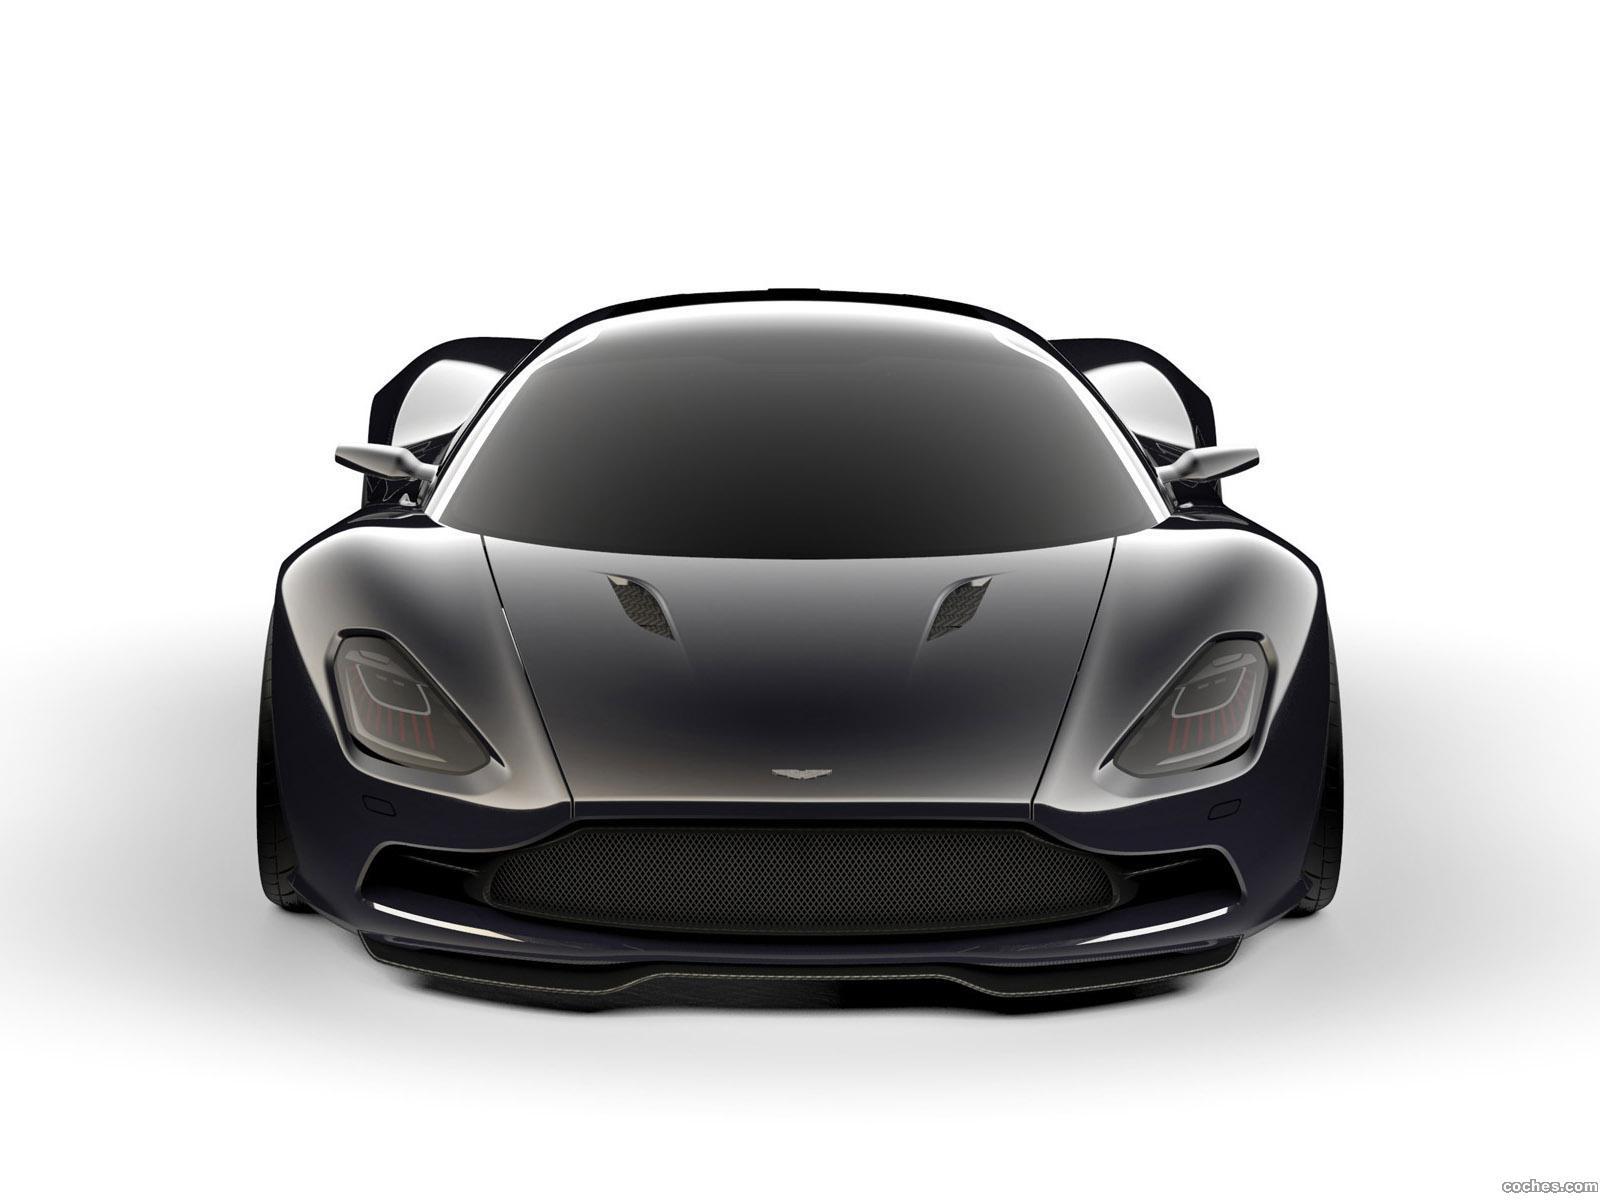 Foto 2 de Aston Martin DBC Concept Design by Samir Sadikhov 2013